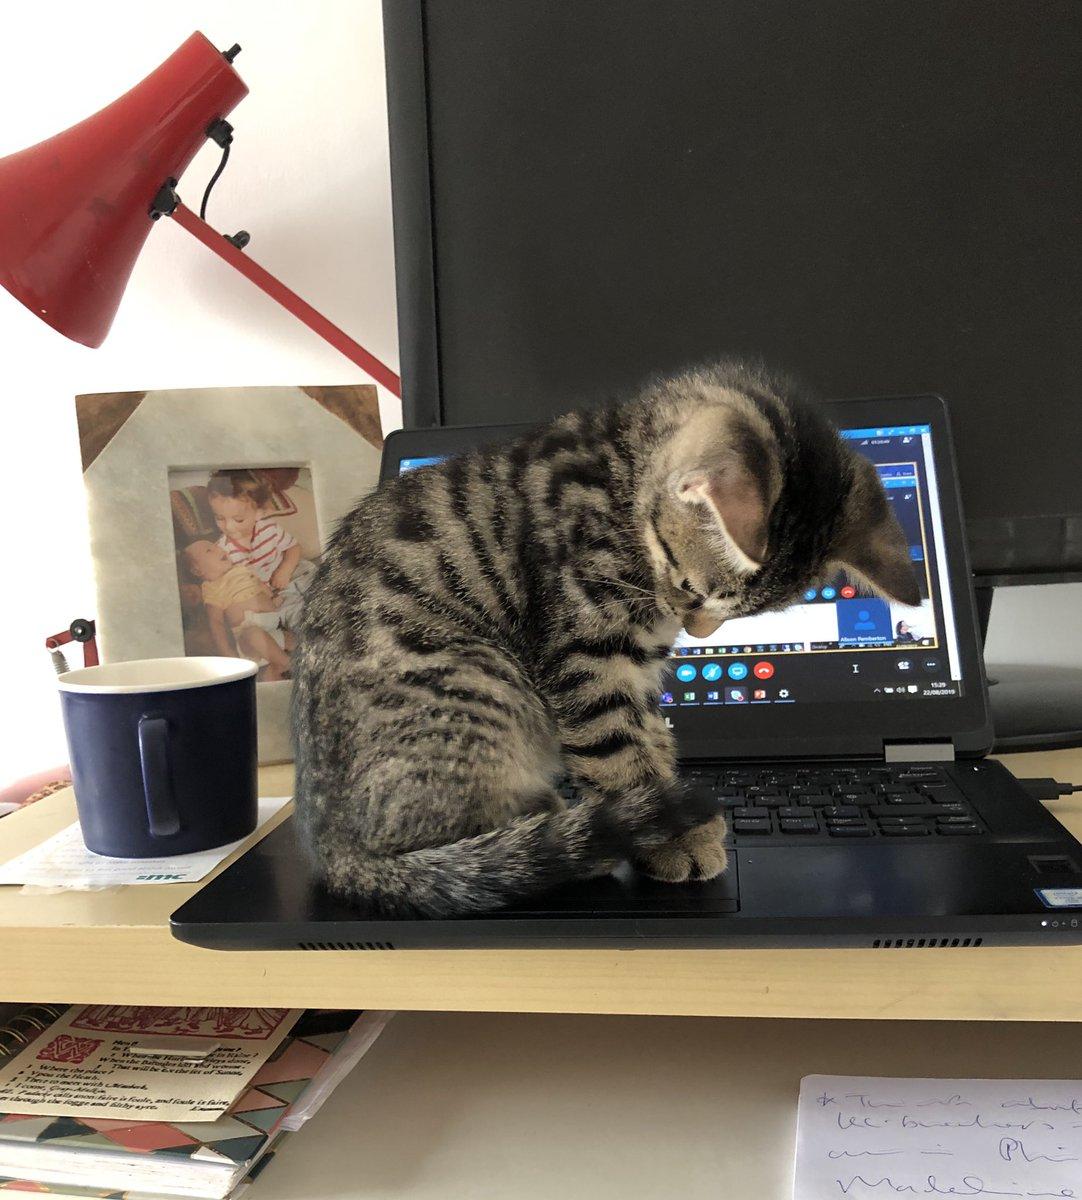 Skype conf call proving difficult. Meet Boy, our new kitten<br>http://pic.twitter.com/NTE4mdxrUE